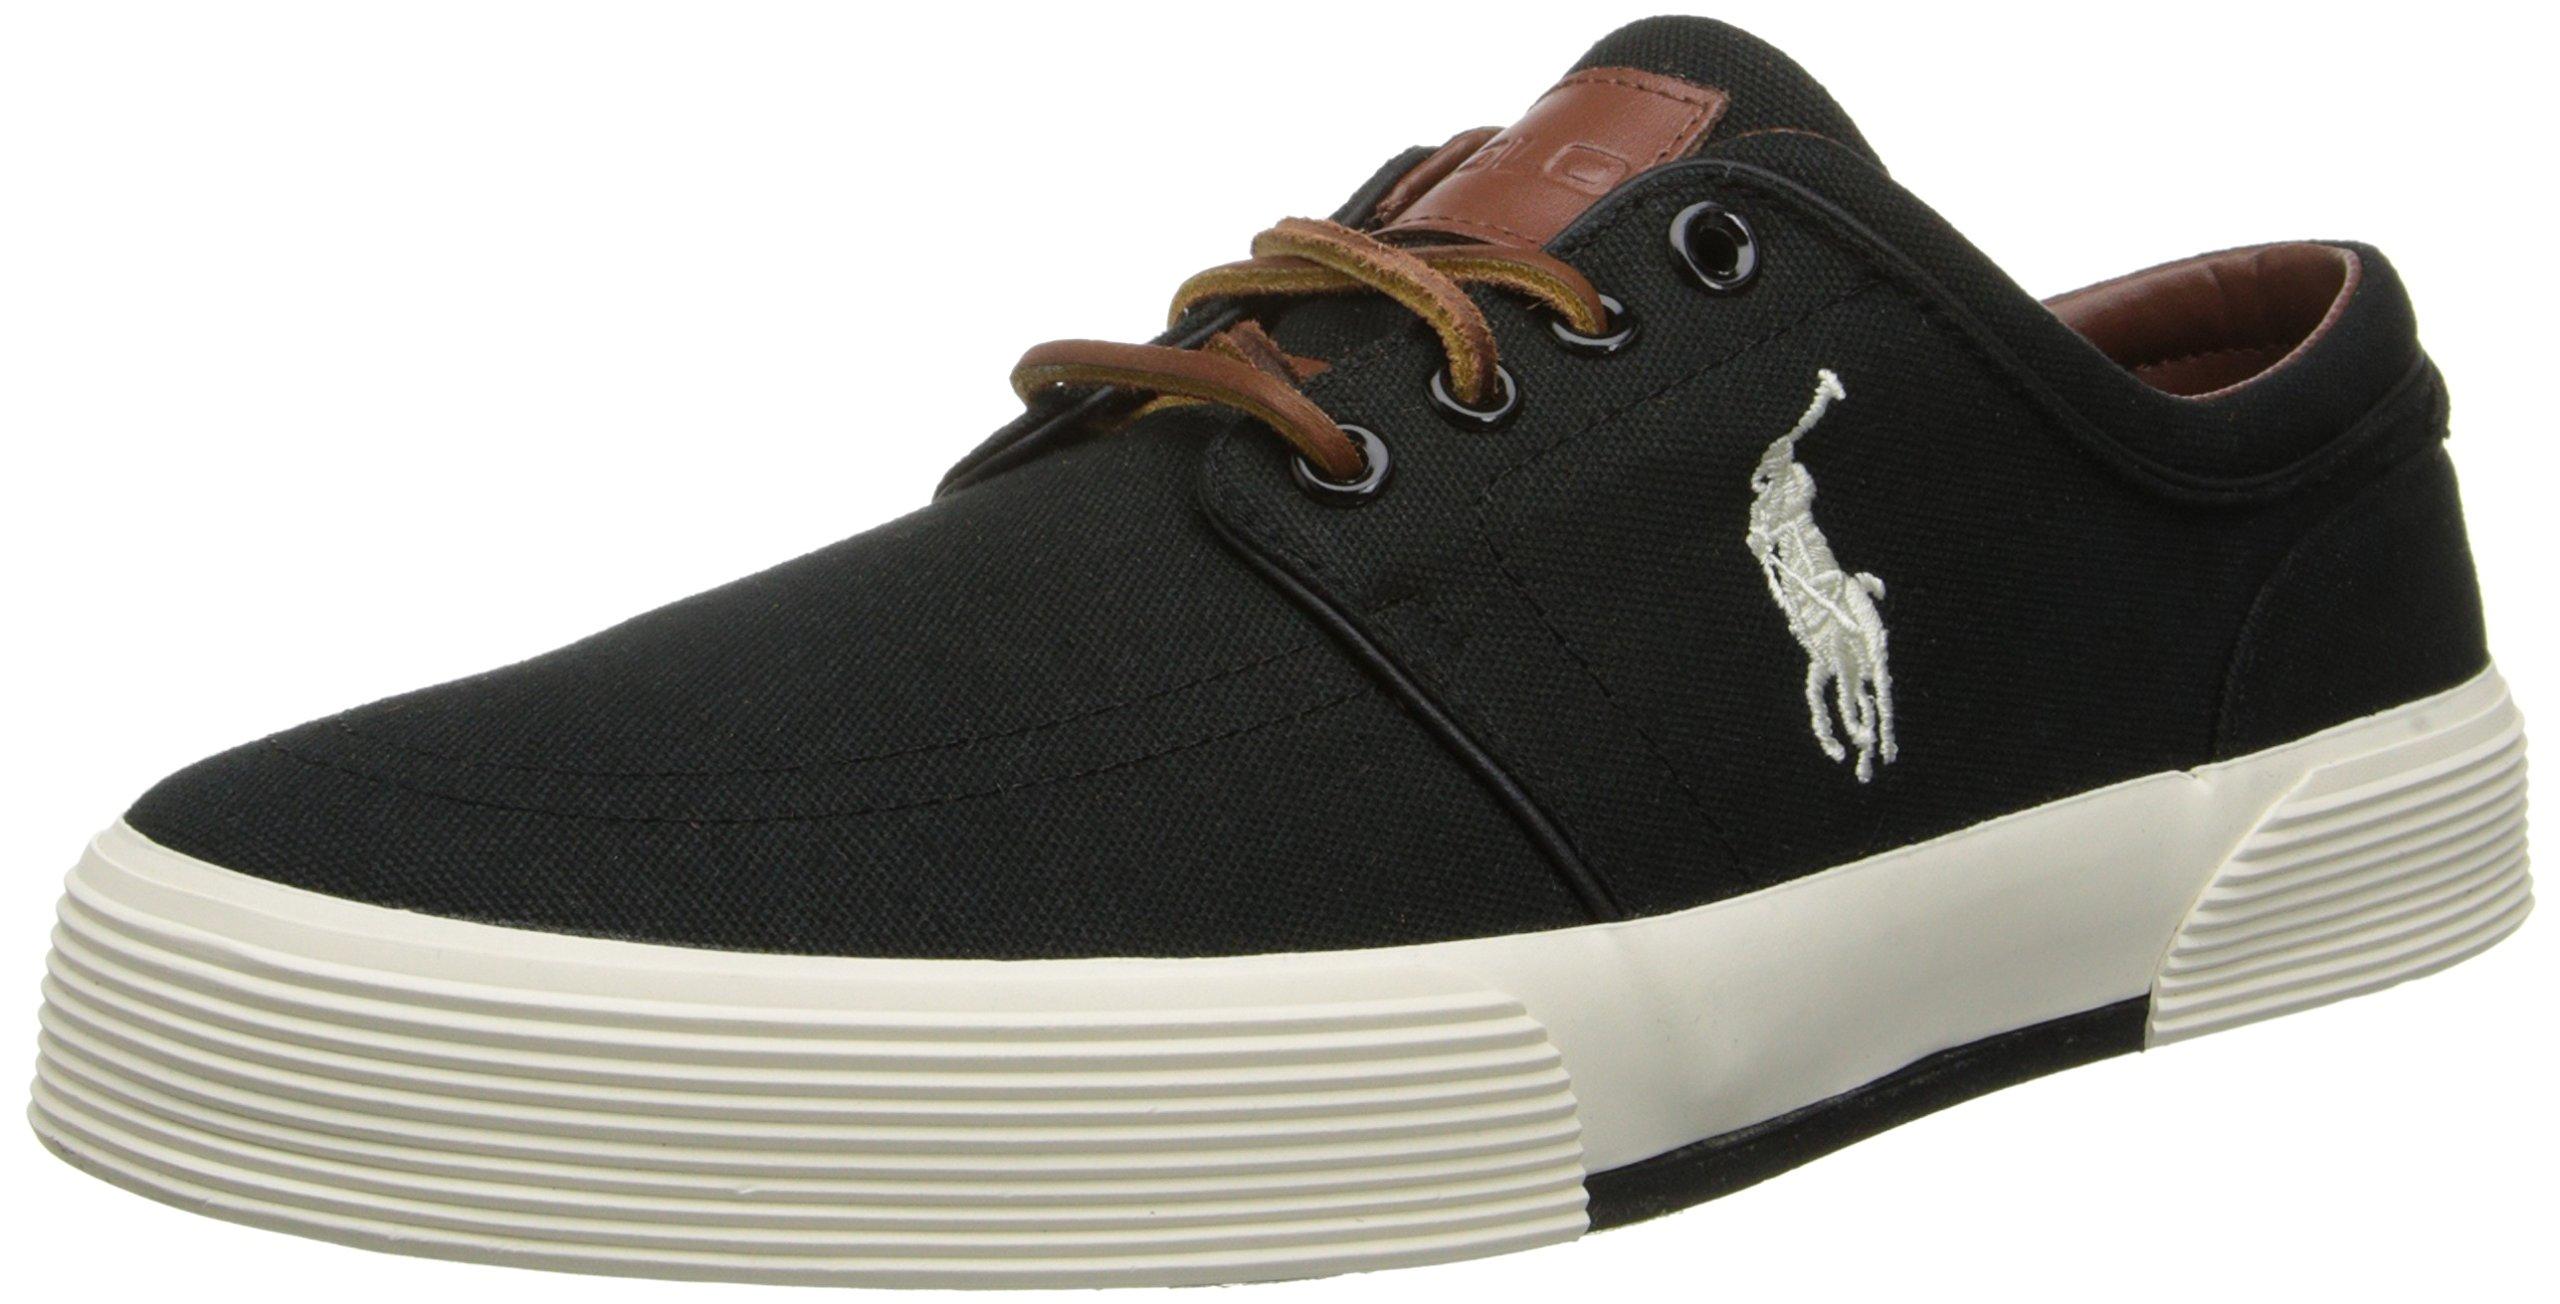 Polo Ralph Lauren Men's Faxon Low Sneaker,Polo Black/Cream,8.5 D US